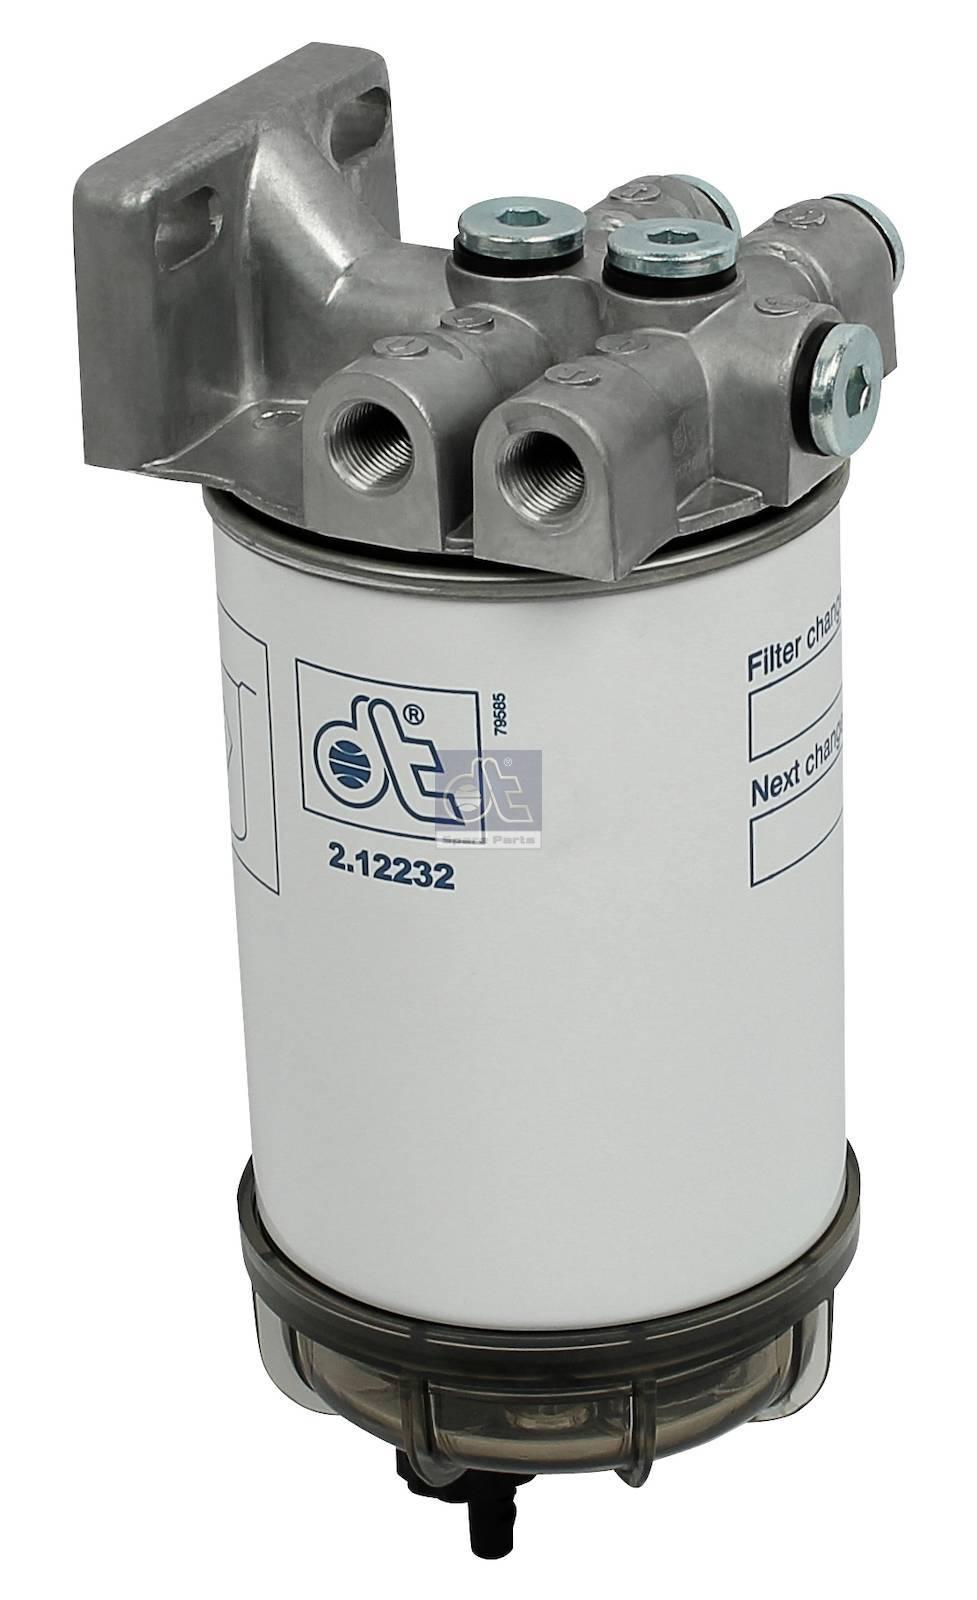 Filtro de combustível, separador d'água, completo